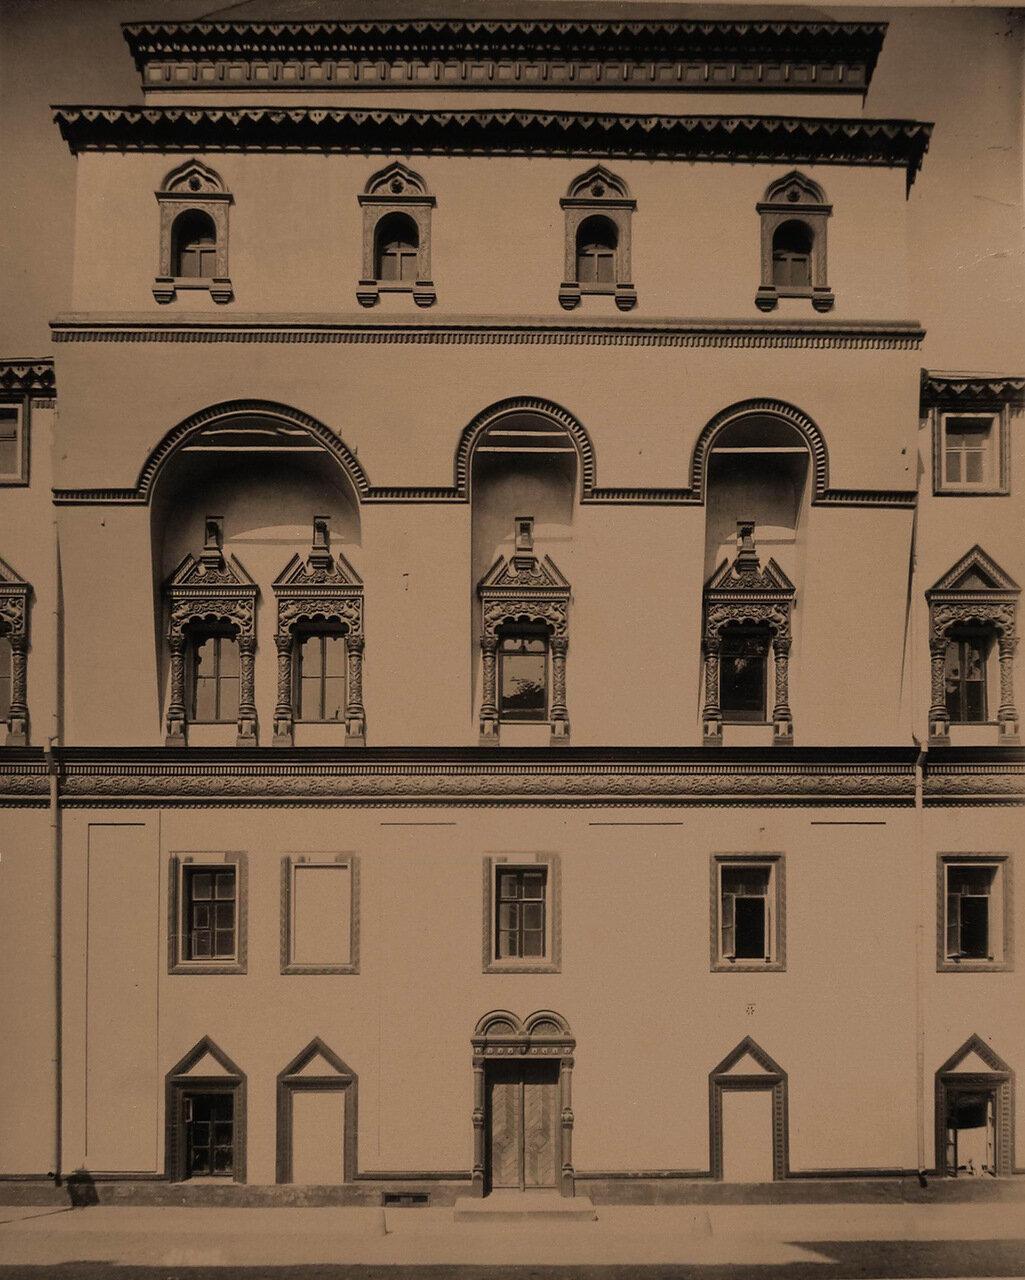 Вид части фасада Потешного дворца в Кремле